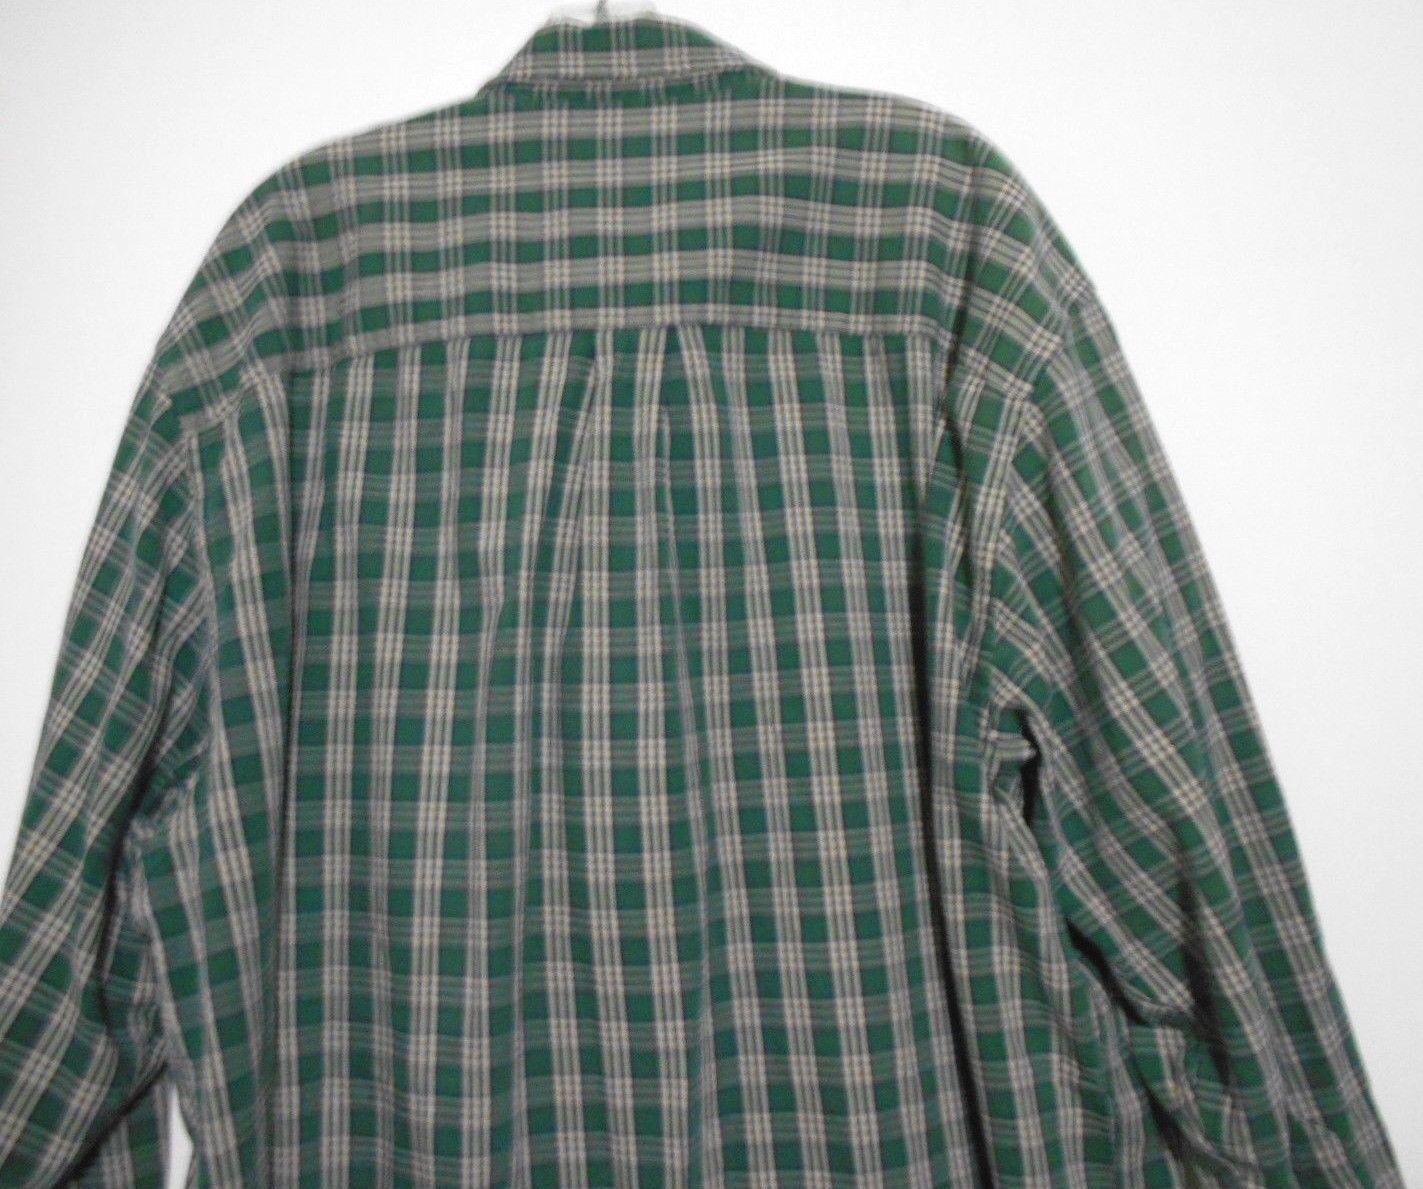 Abercromble & Fitch Size XL Mens  Green Plaid 100% Cotton  Long Sleeve Shirt